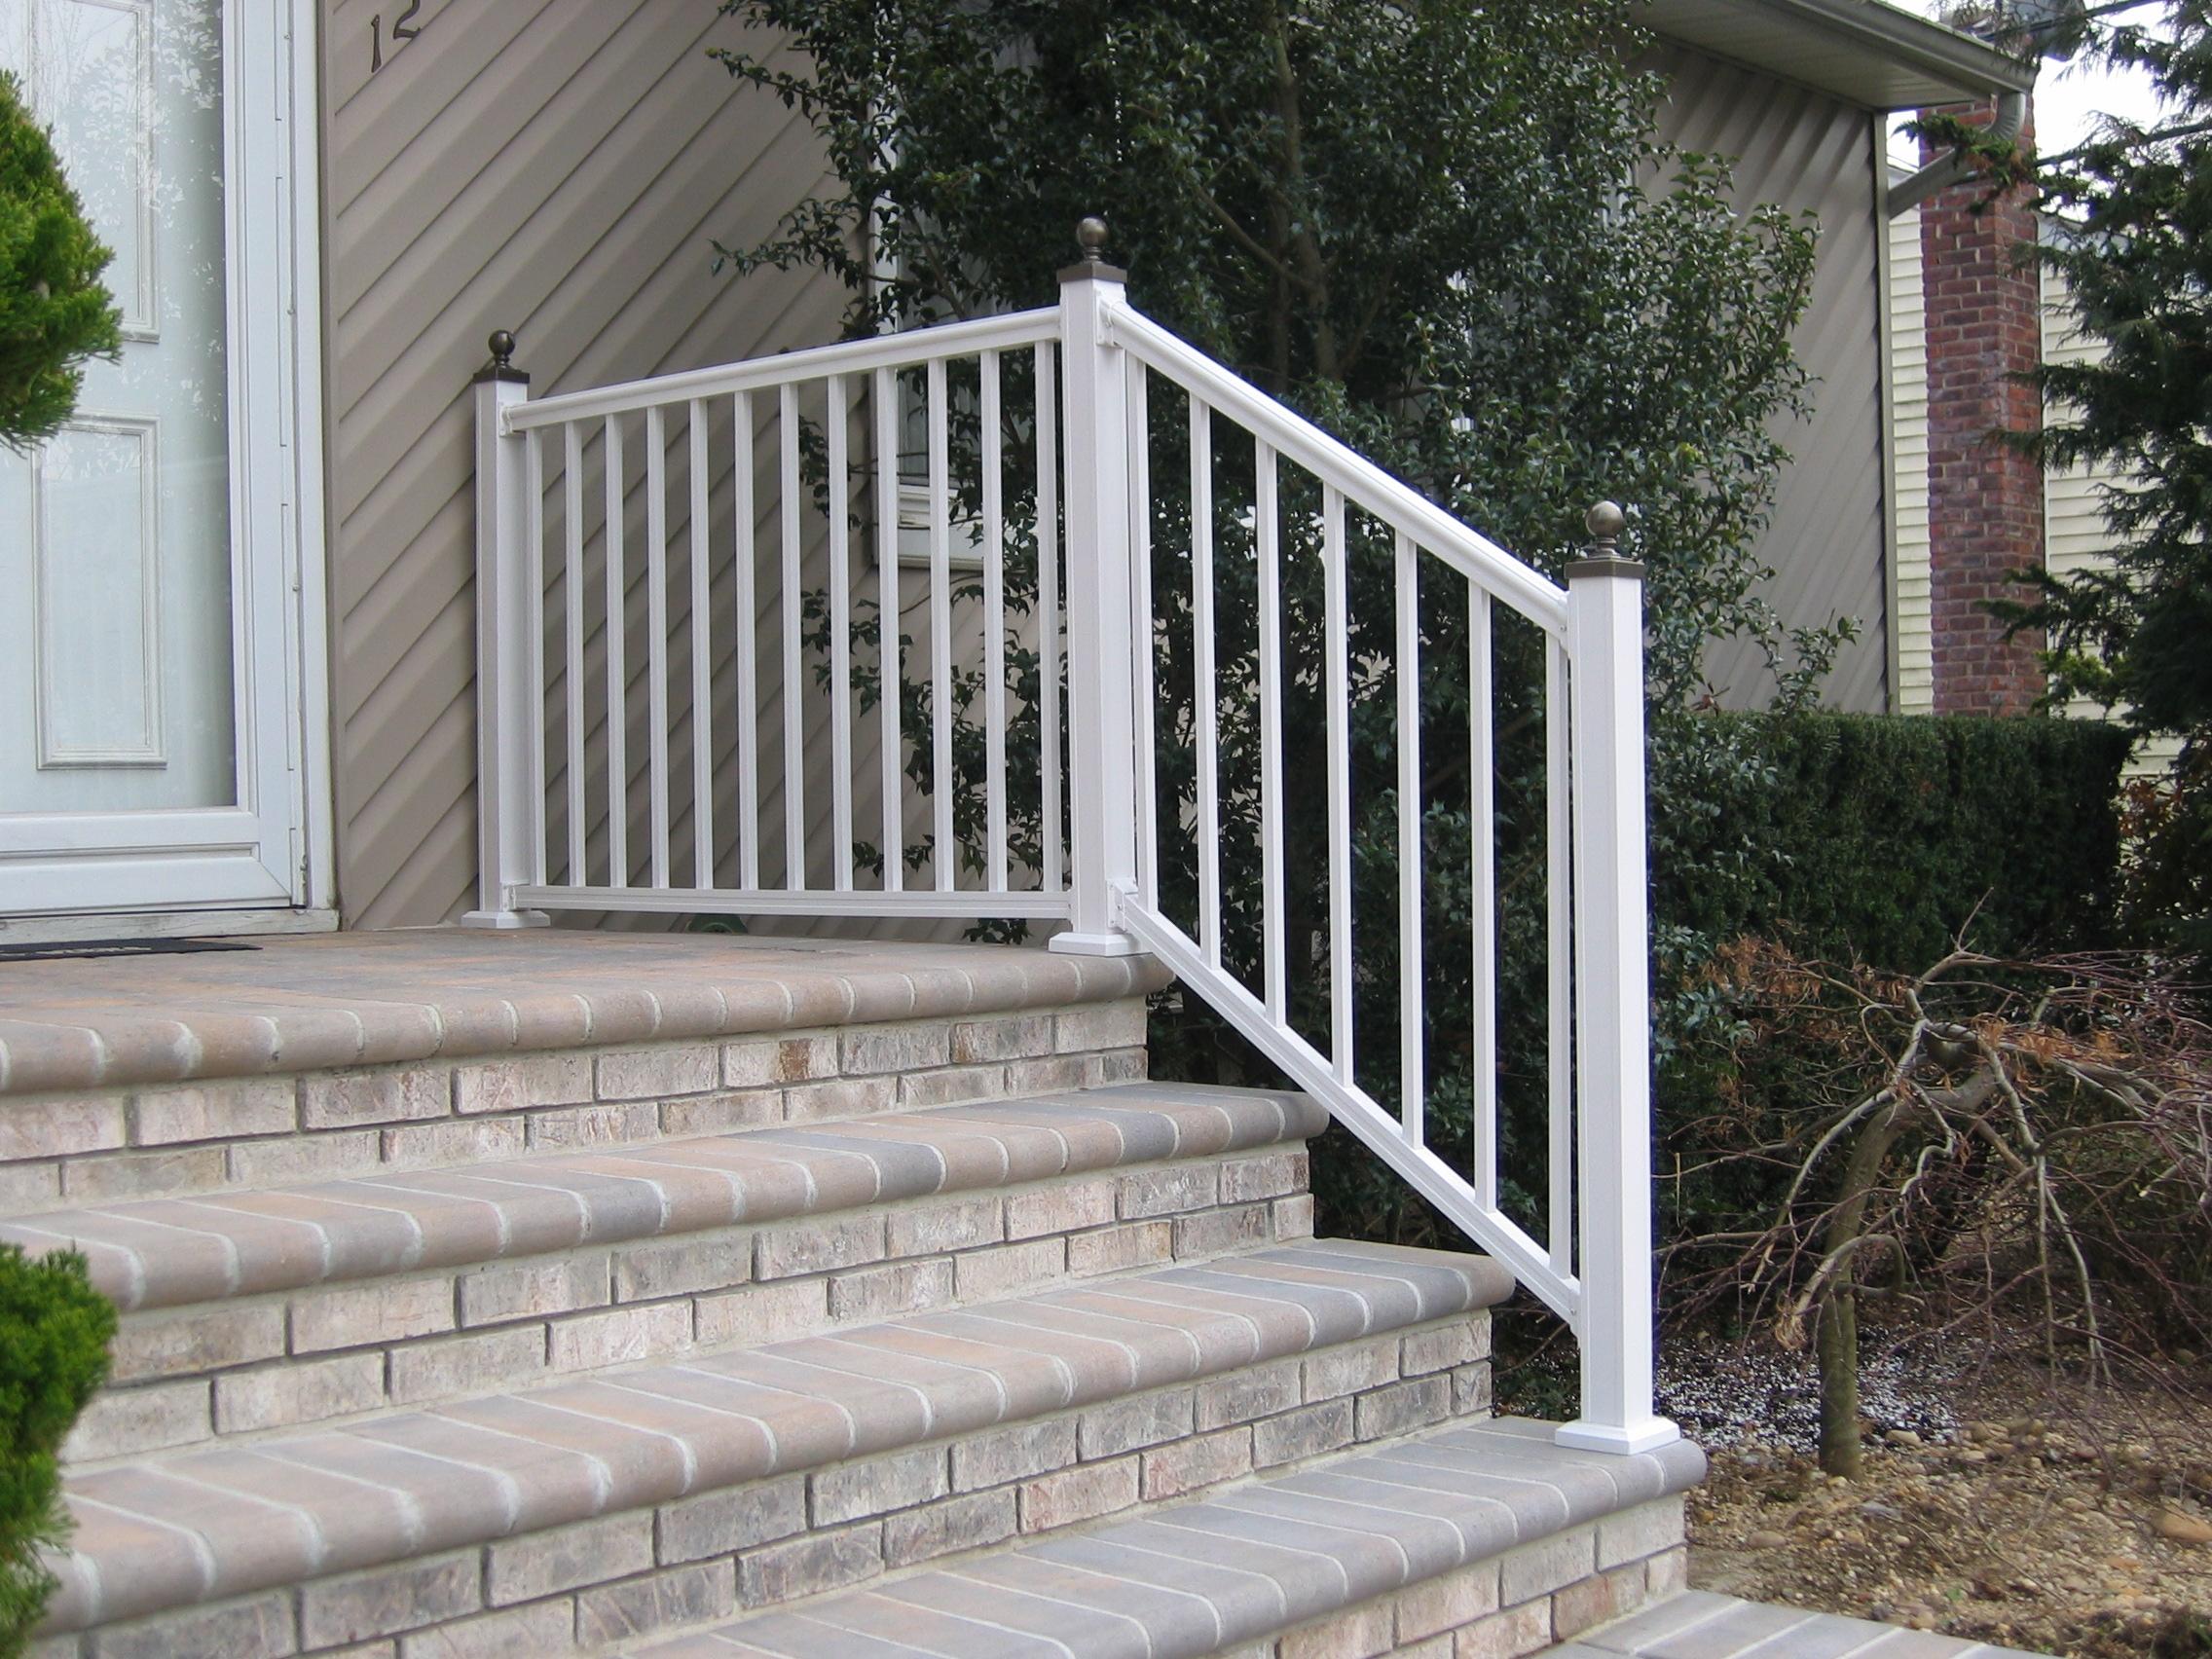 Rl arabian series aluminum railing white color with